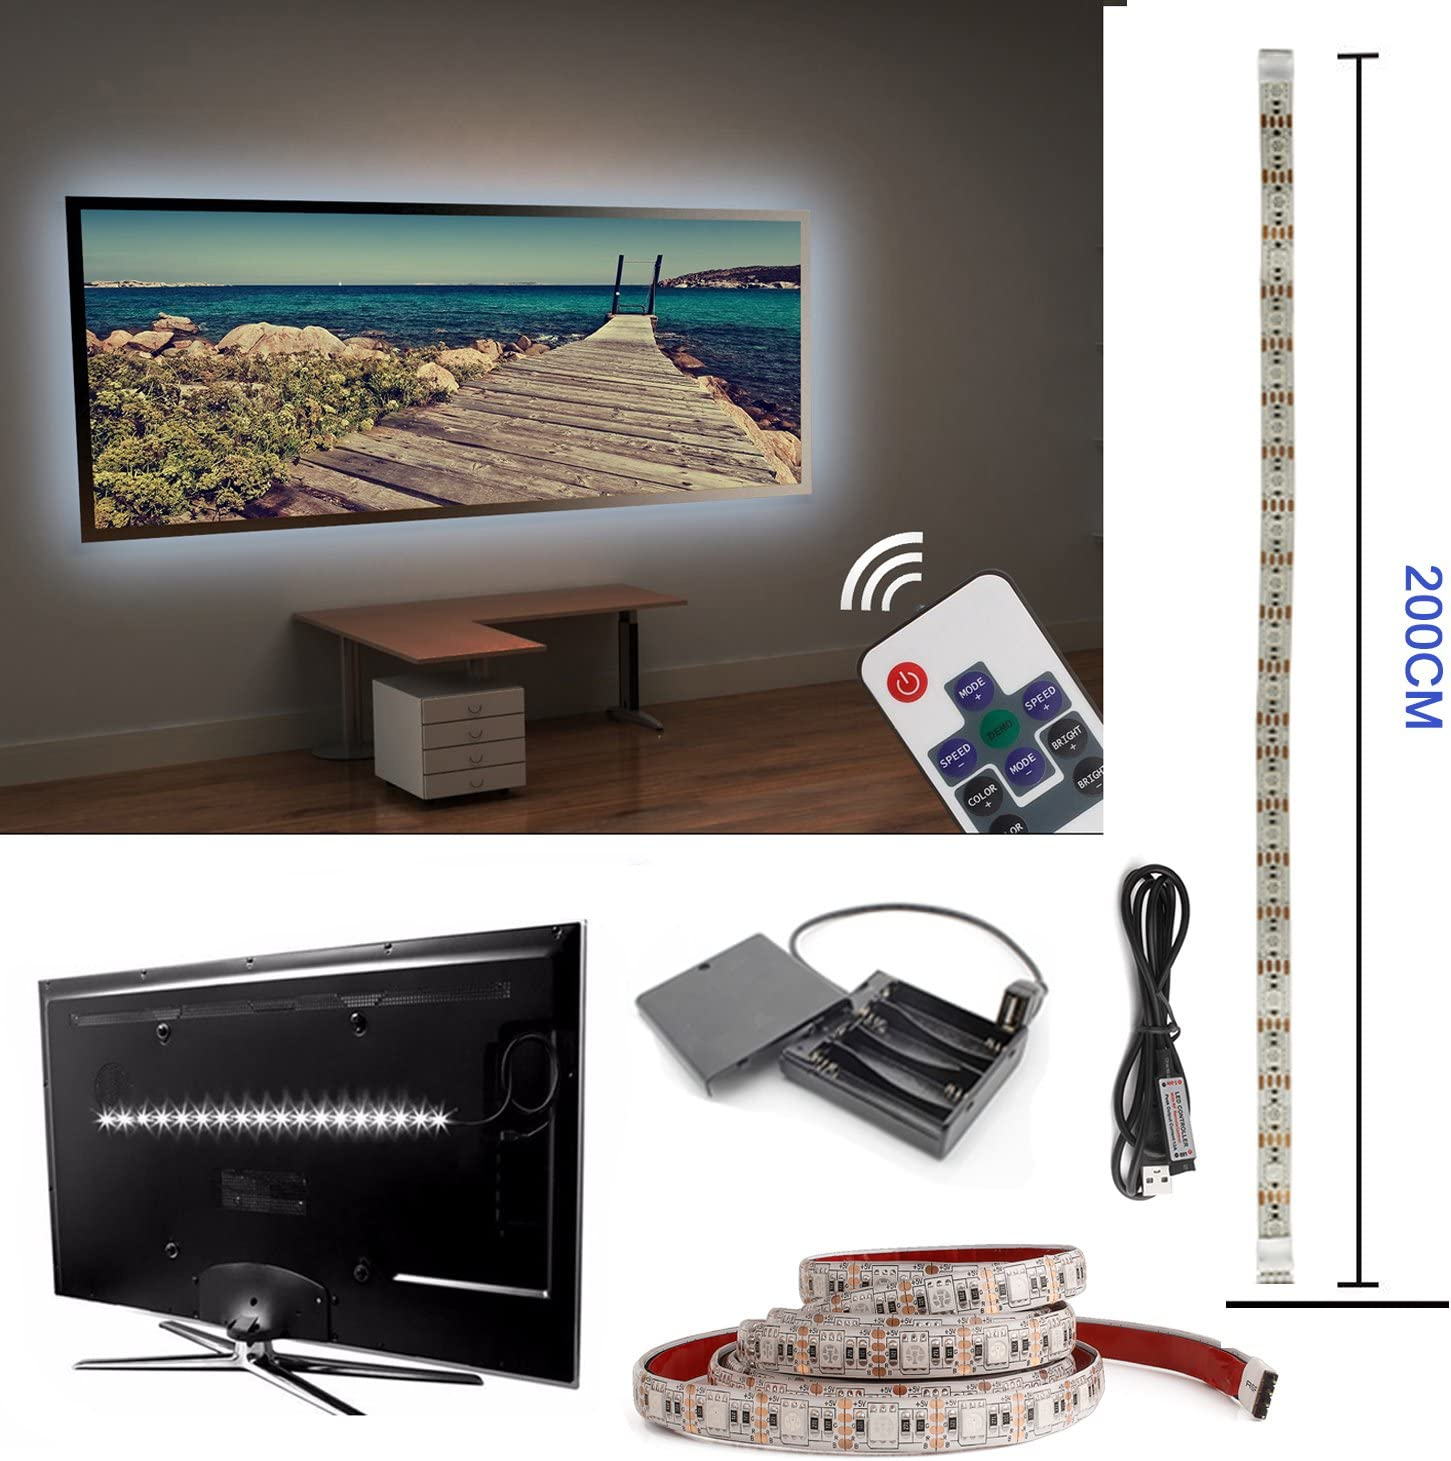 Televisor LED TV Fondo, 200 cm usb led iluminación de fondo para monitor de pantalla de TV y PC, RGB LED Strip con batería de caja: Amazon.es: Iluminación